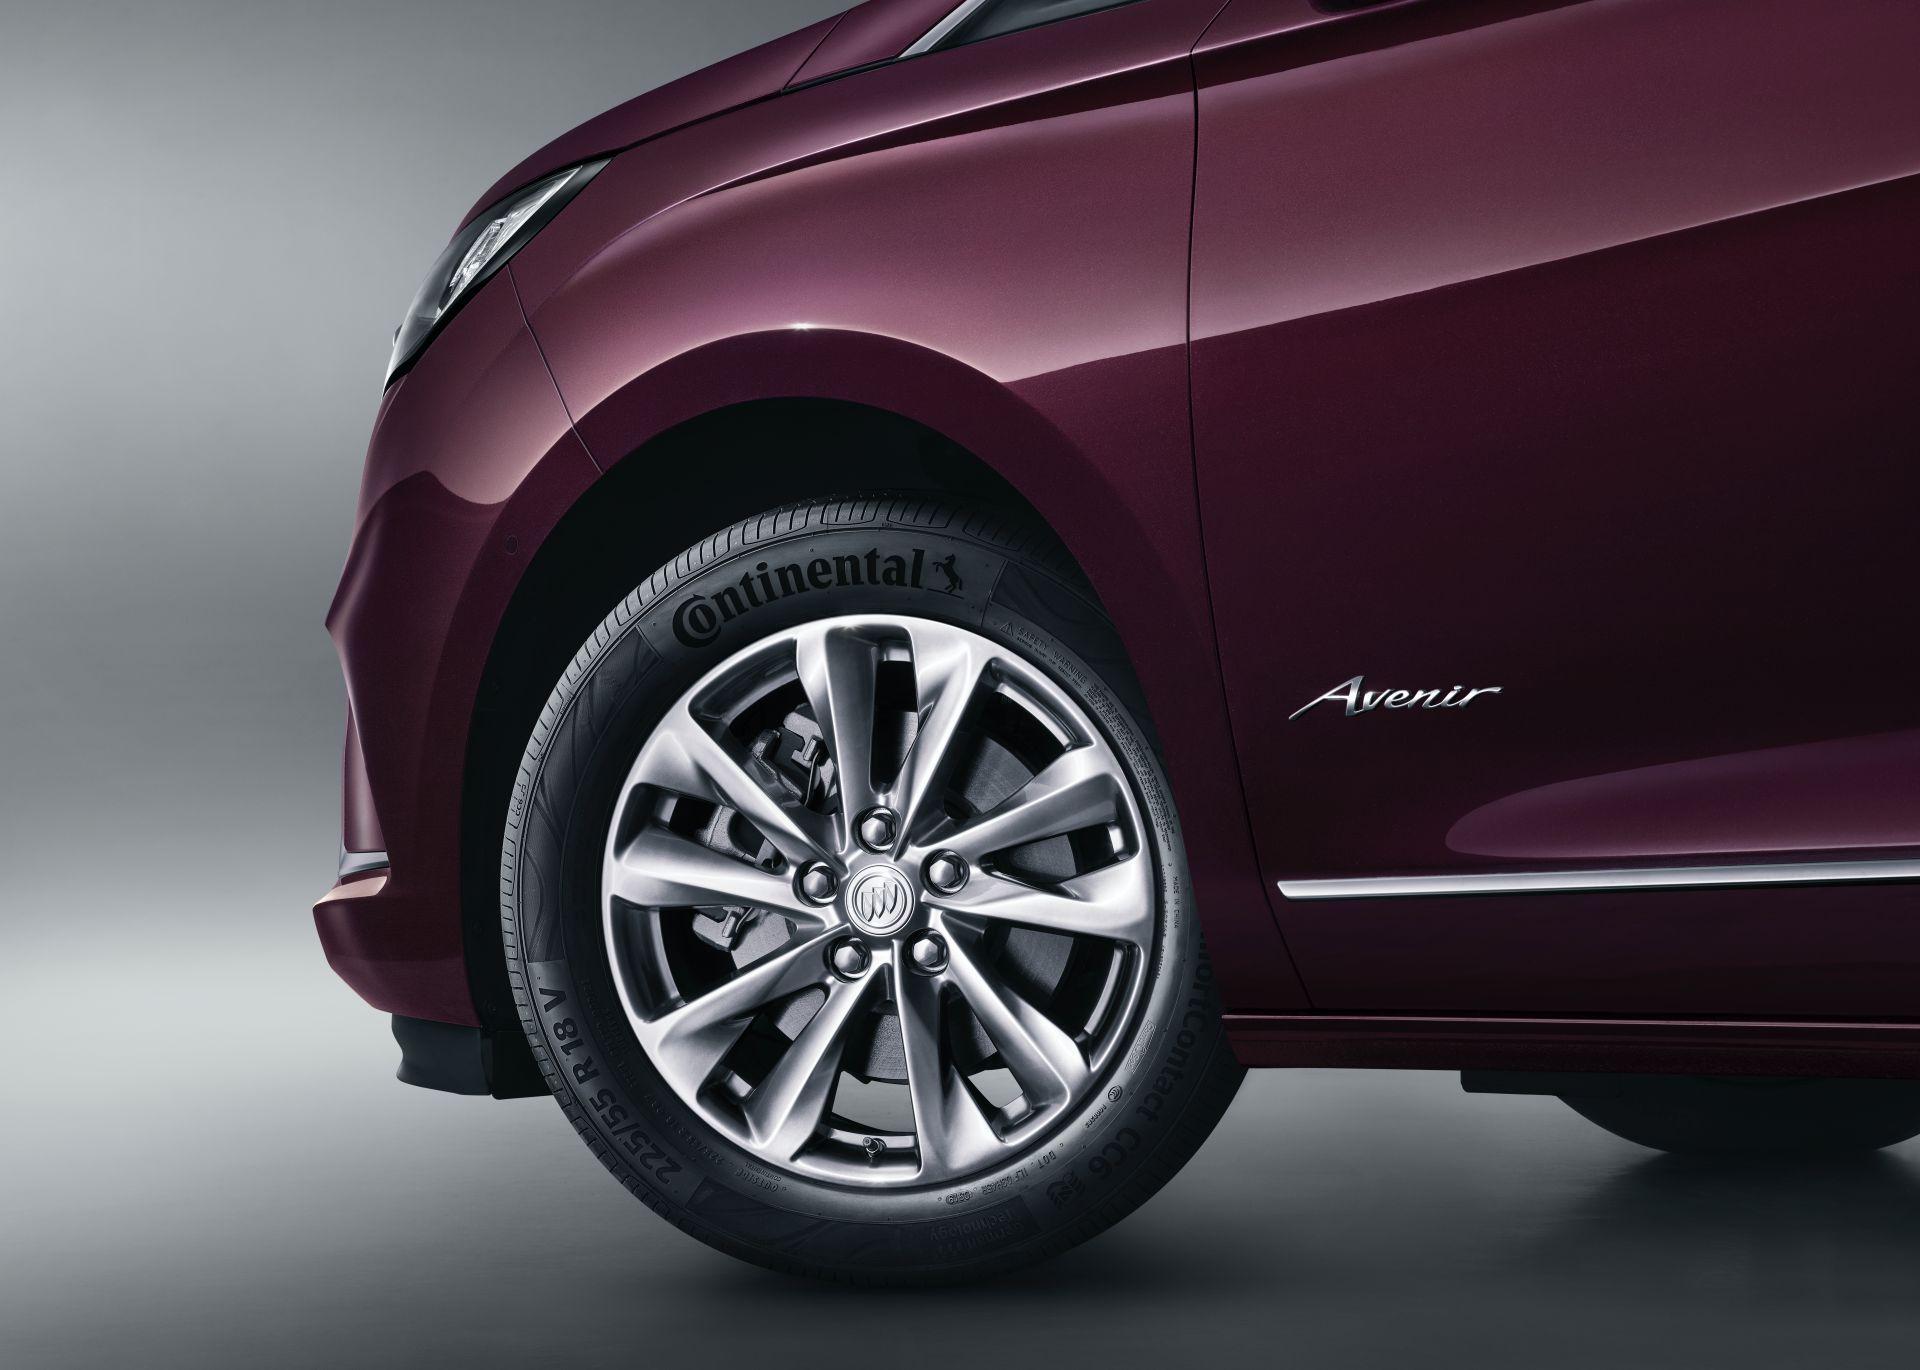 2020-Buick-GL8-Avenir-China-spec-8